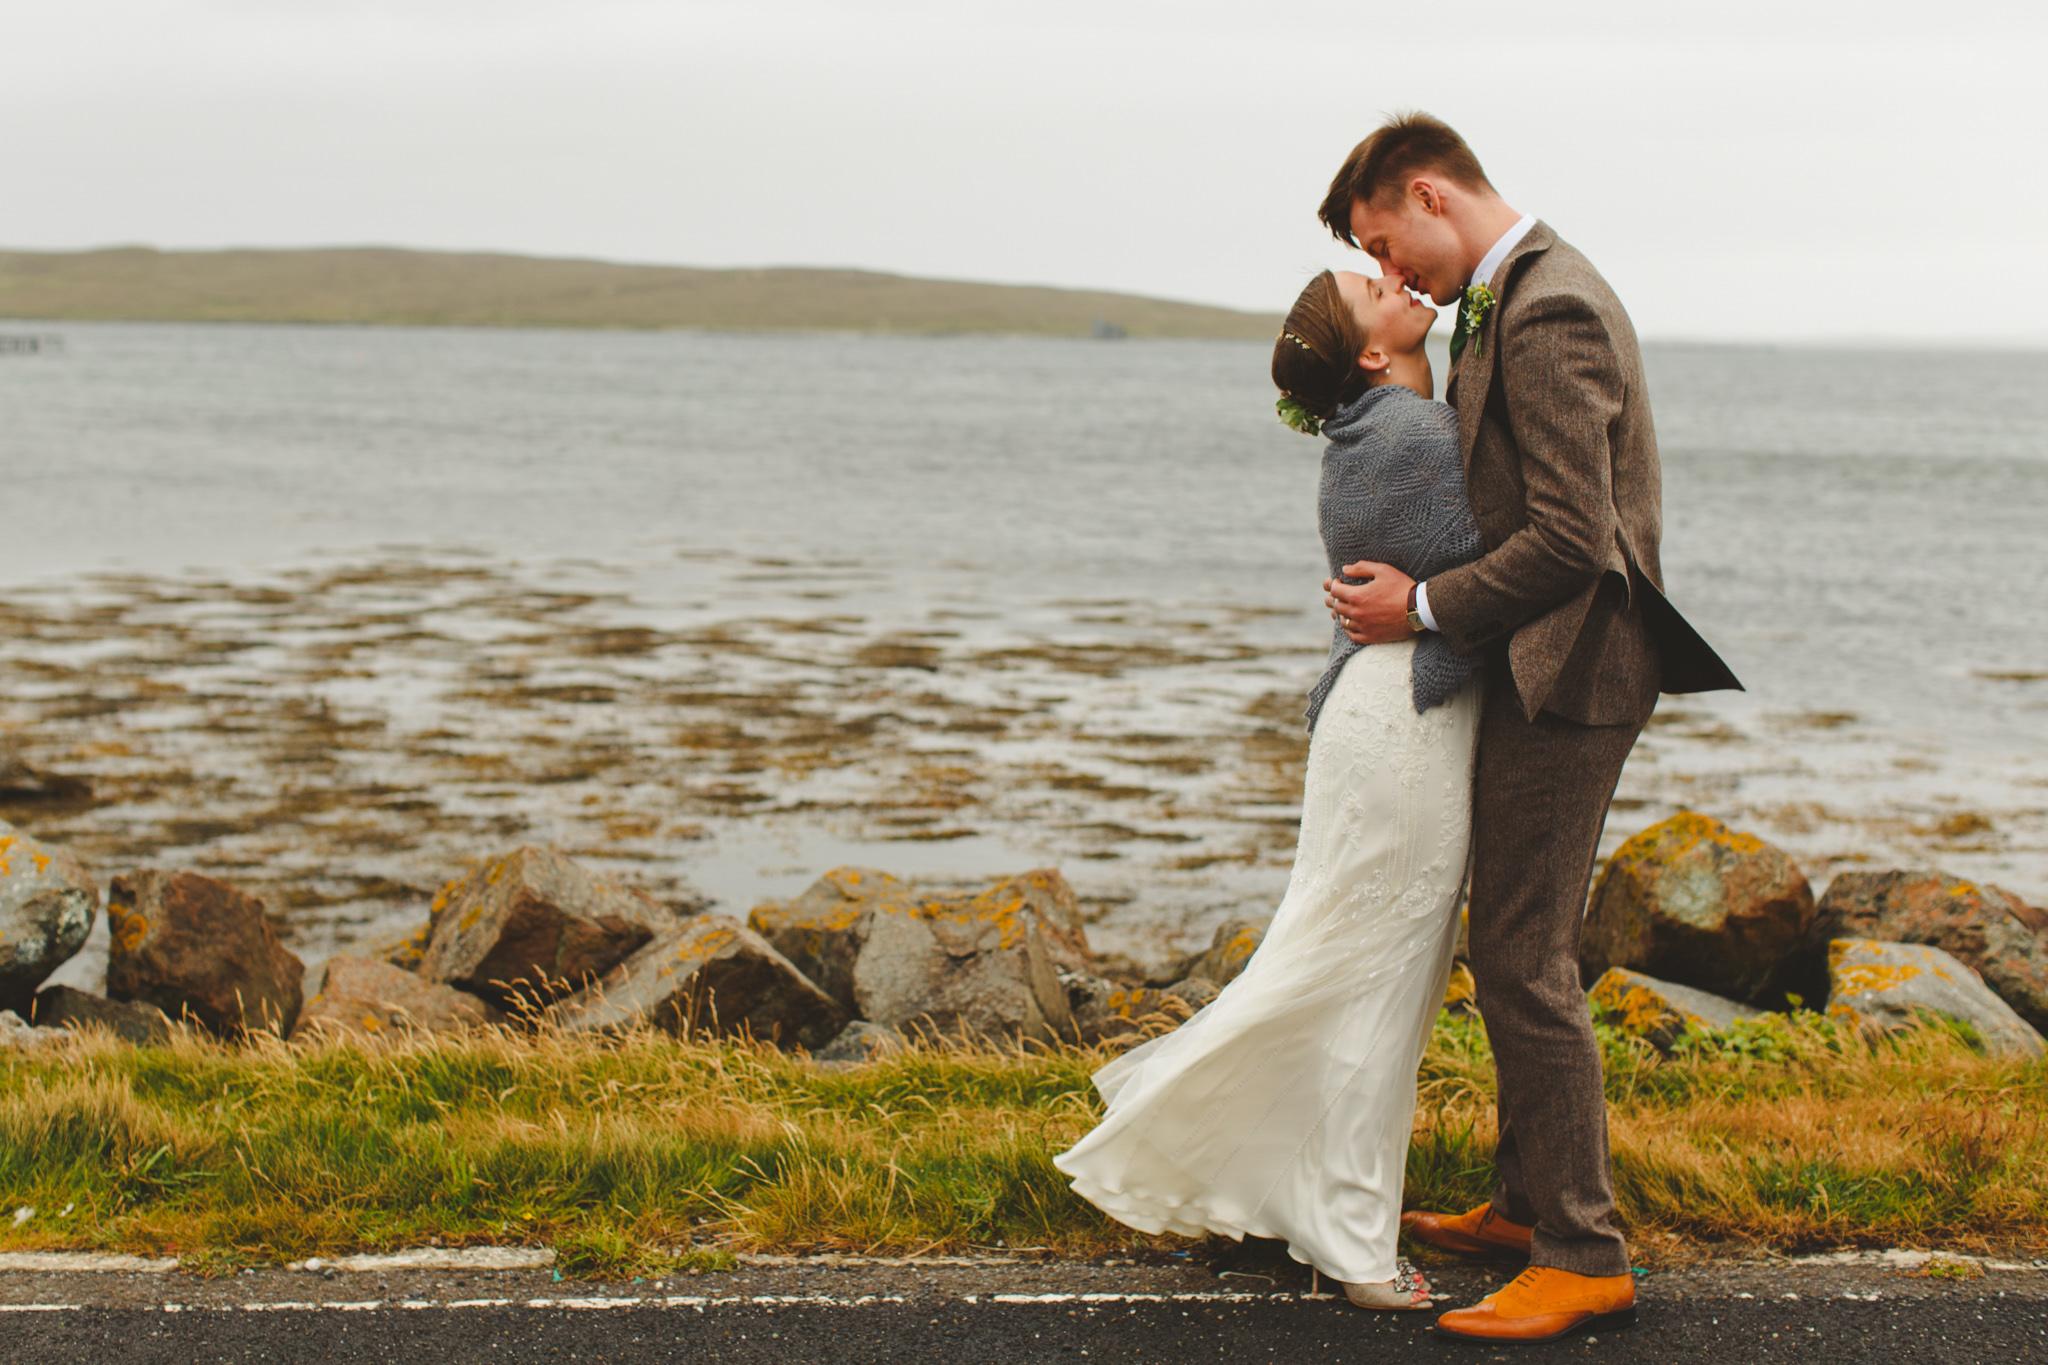 derby-wedding-photographer-camera-hannah-blog-31.jpg